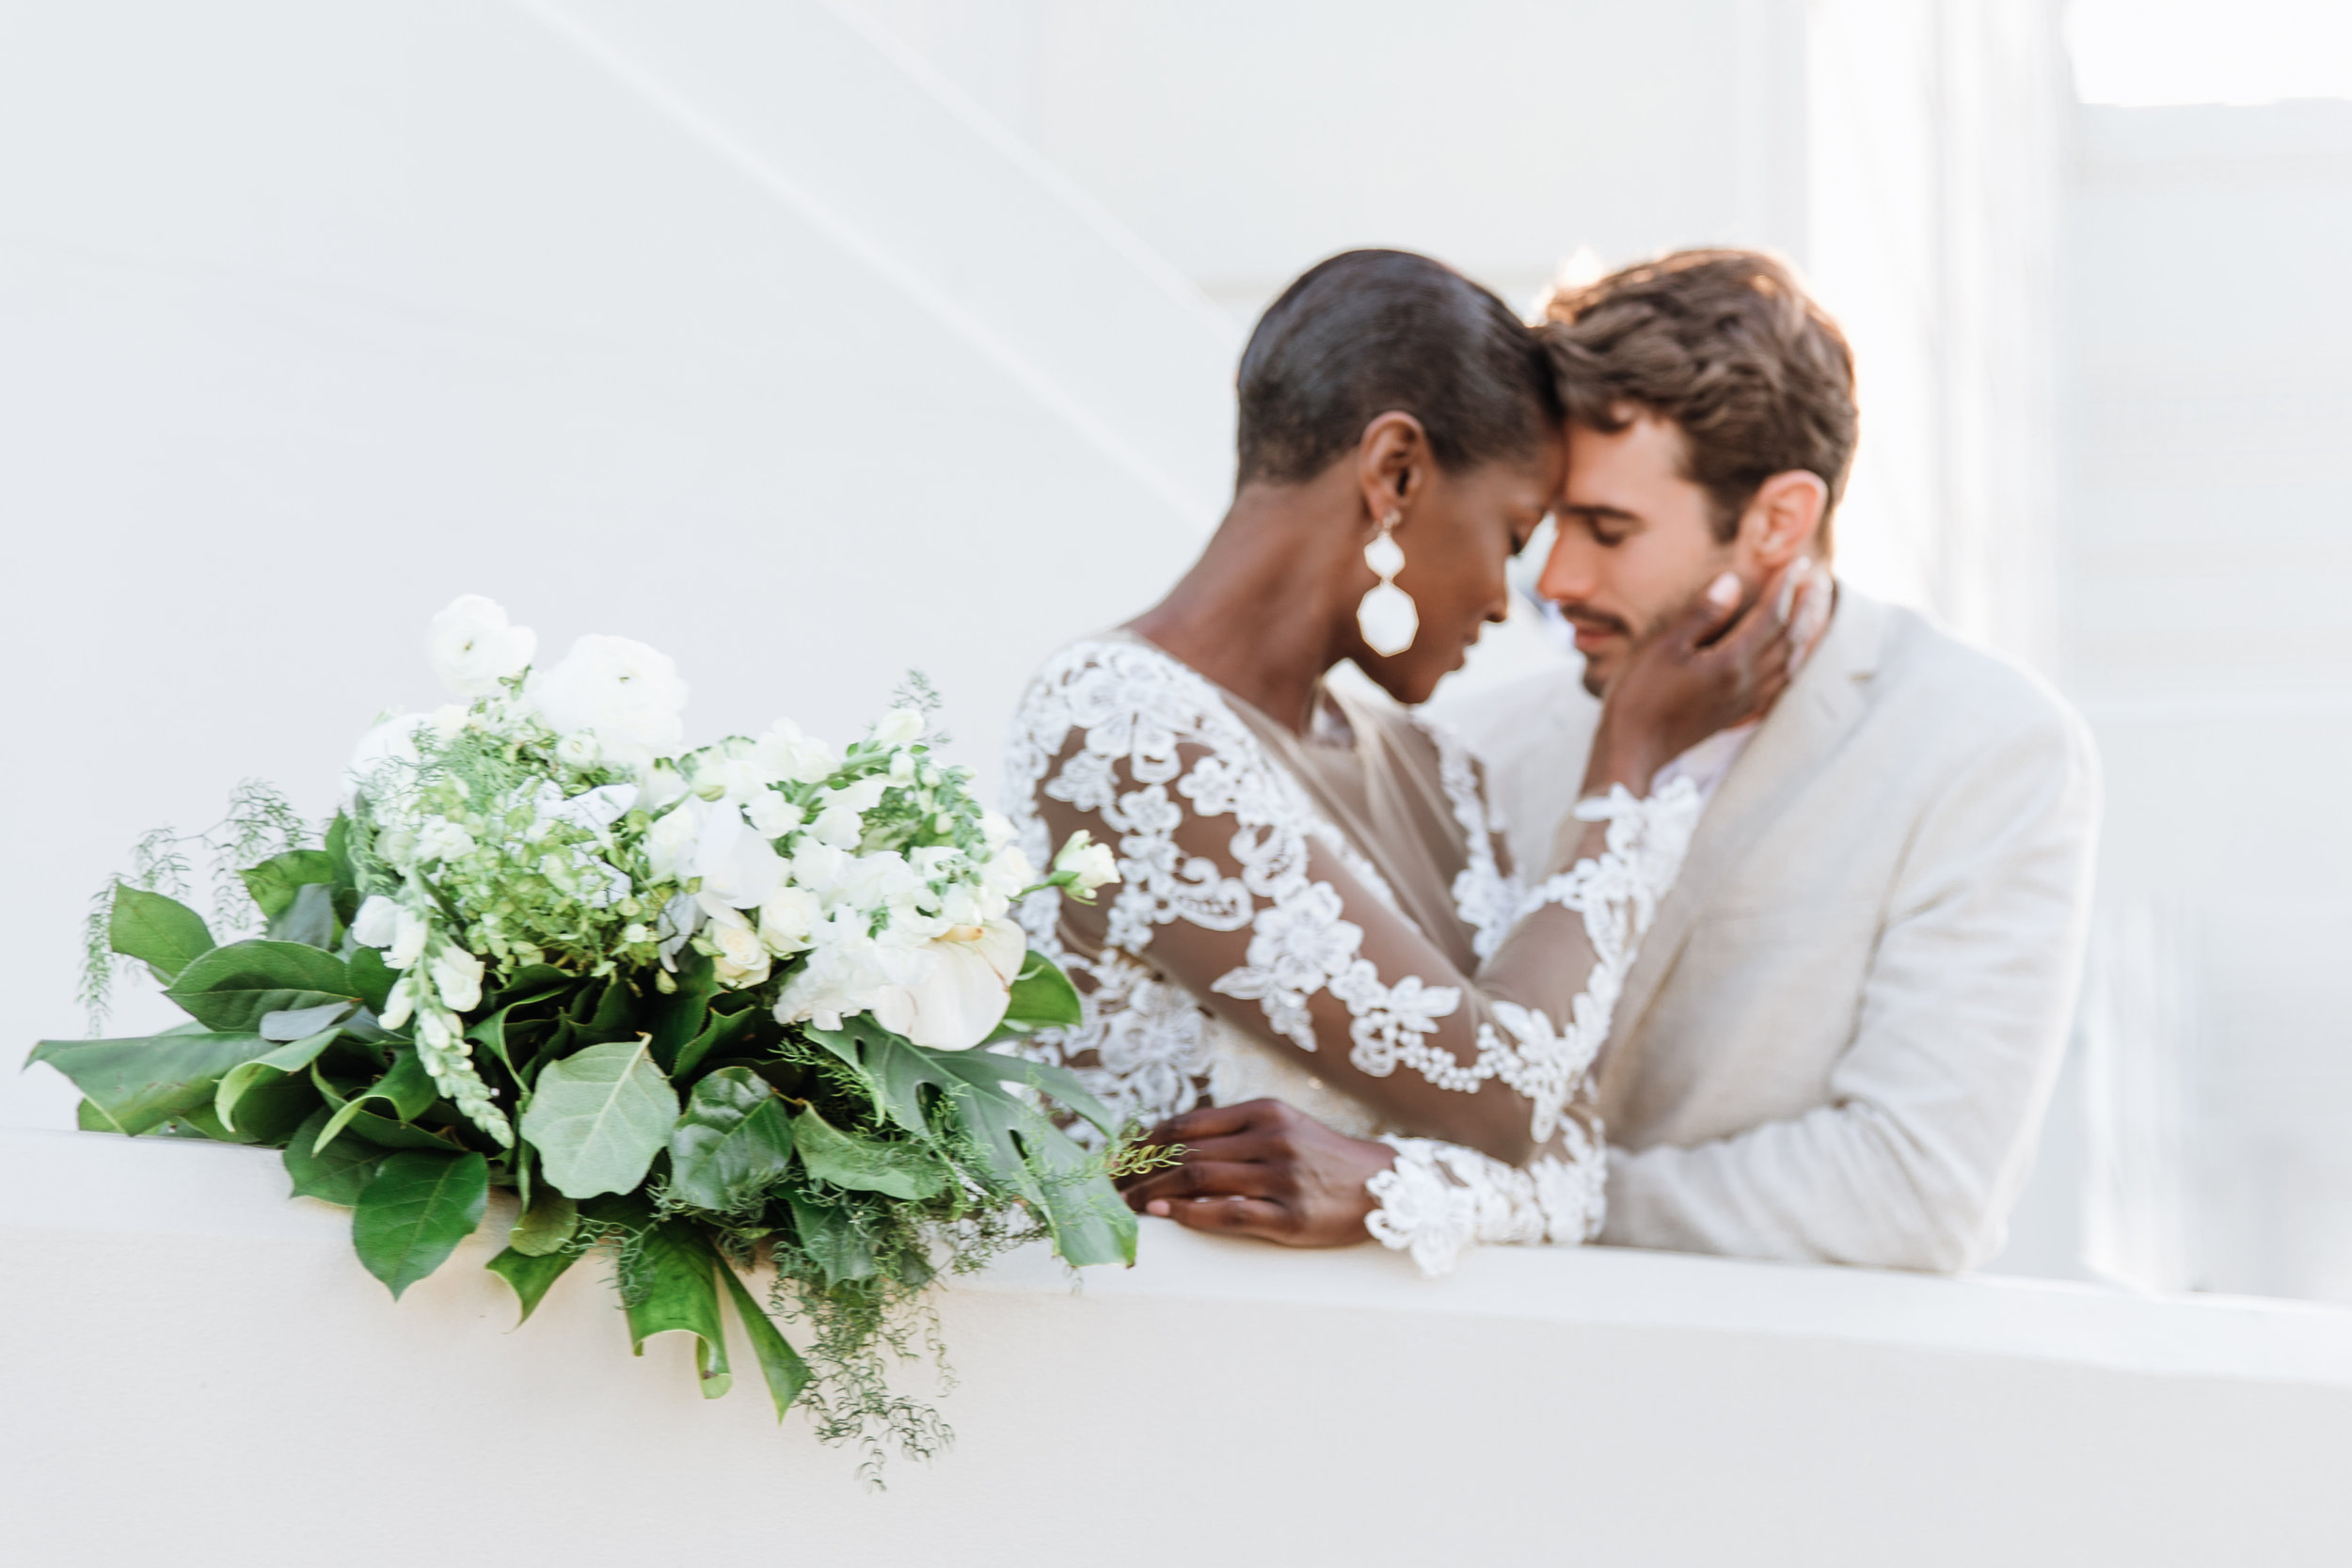 los-angeles-california-griffith-observatory-wedding-bridal-photography-michael-cozzens-41.jpg